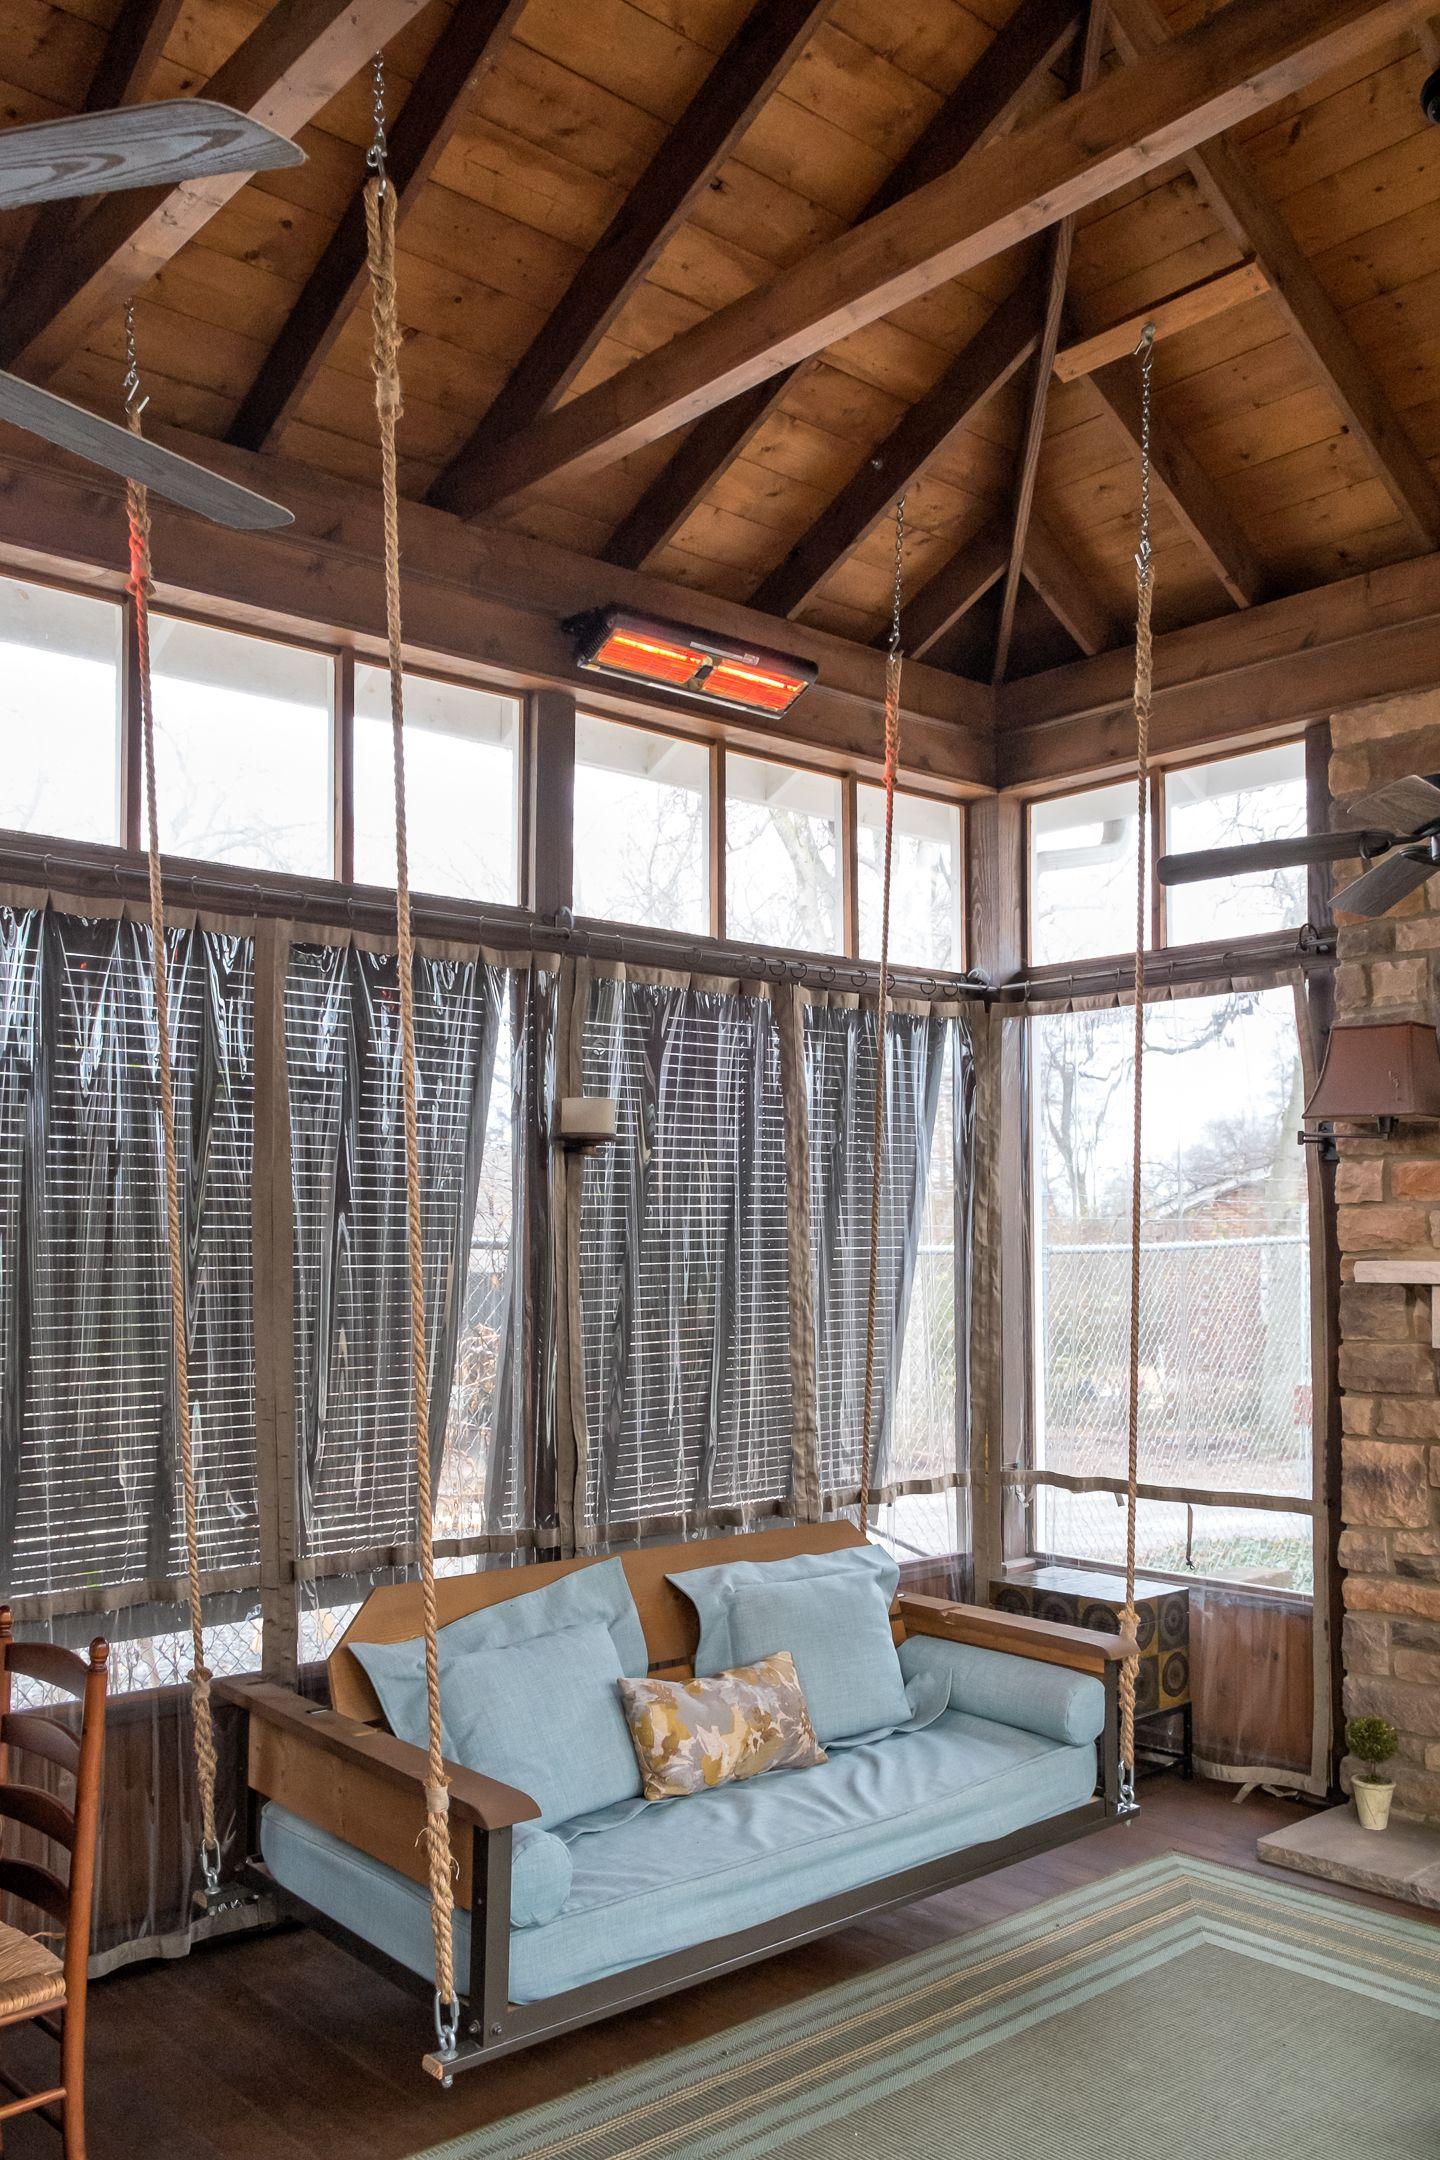 h ngebett selber bauen 44 diy ideen f r bett aus paletten im garten garten. Black Bedroom Furniture Sets. Home Design Ideas